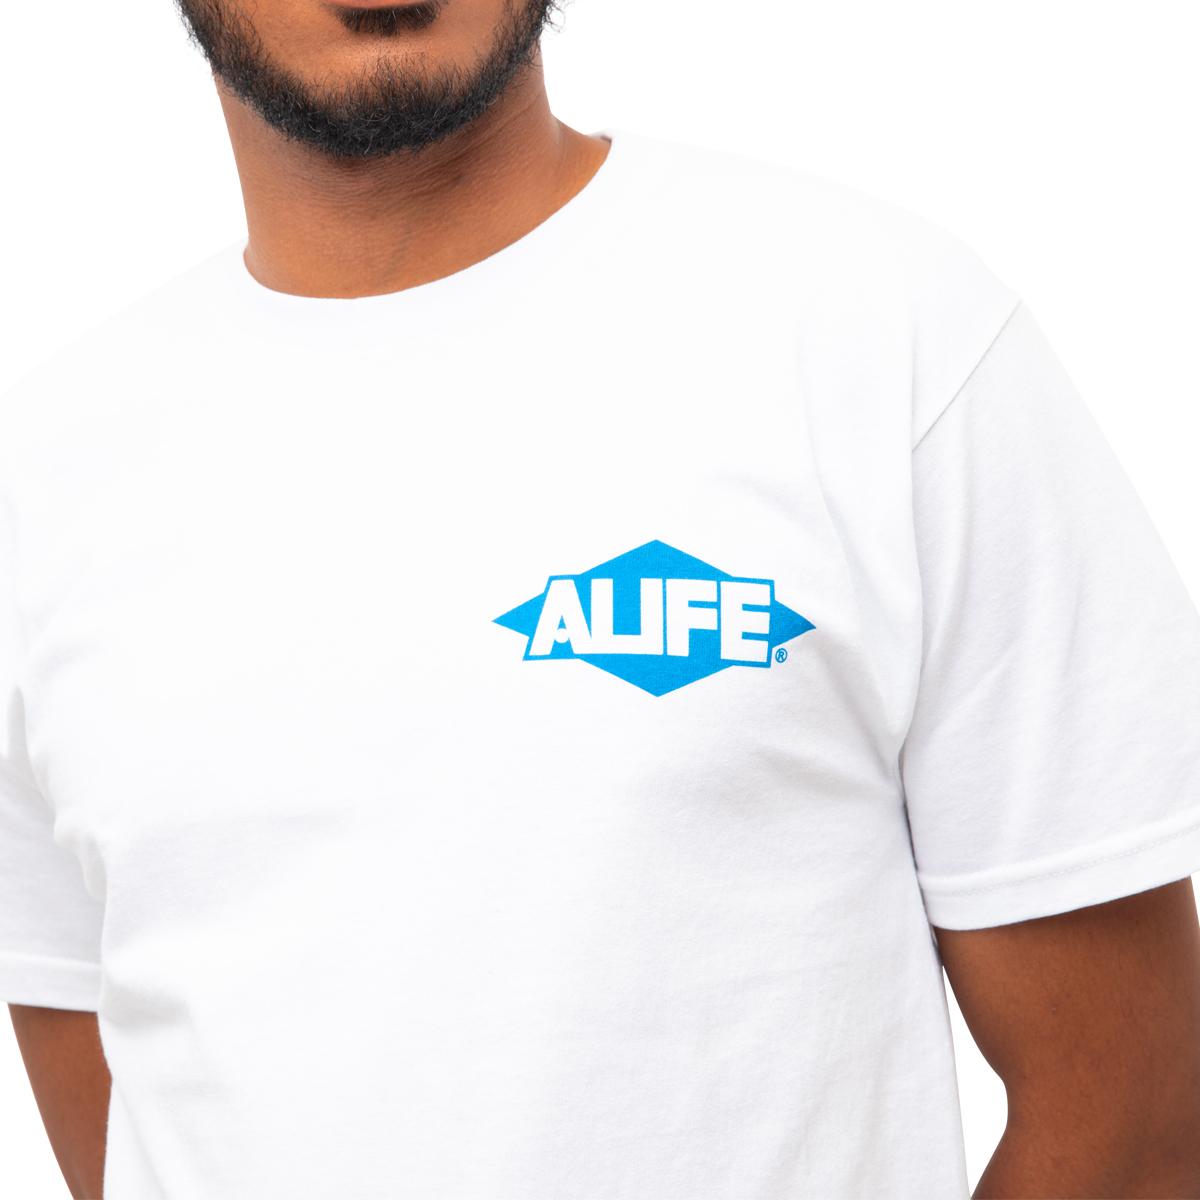 Alife Drafting Tee